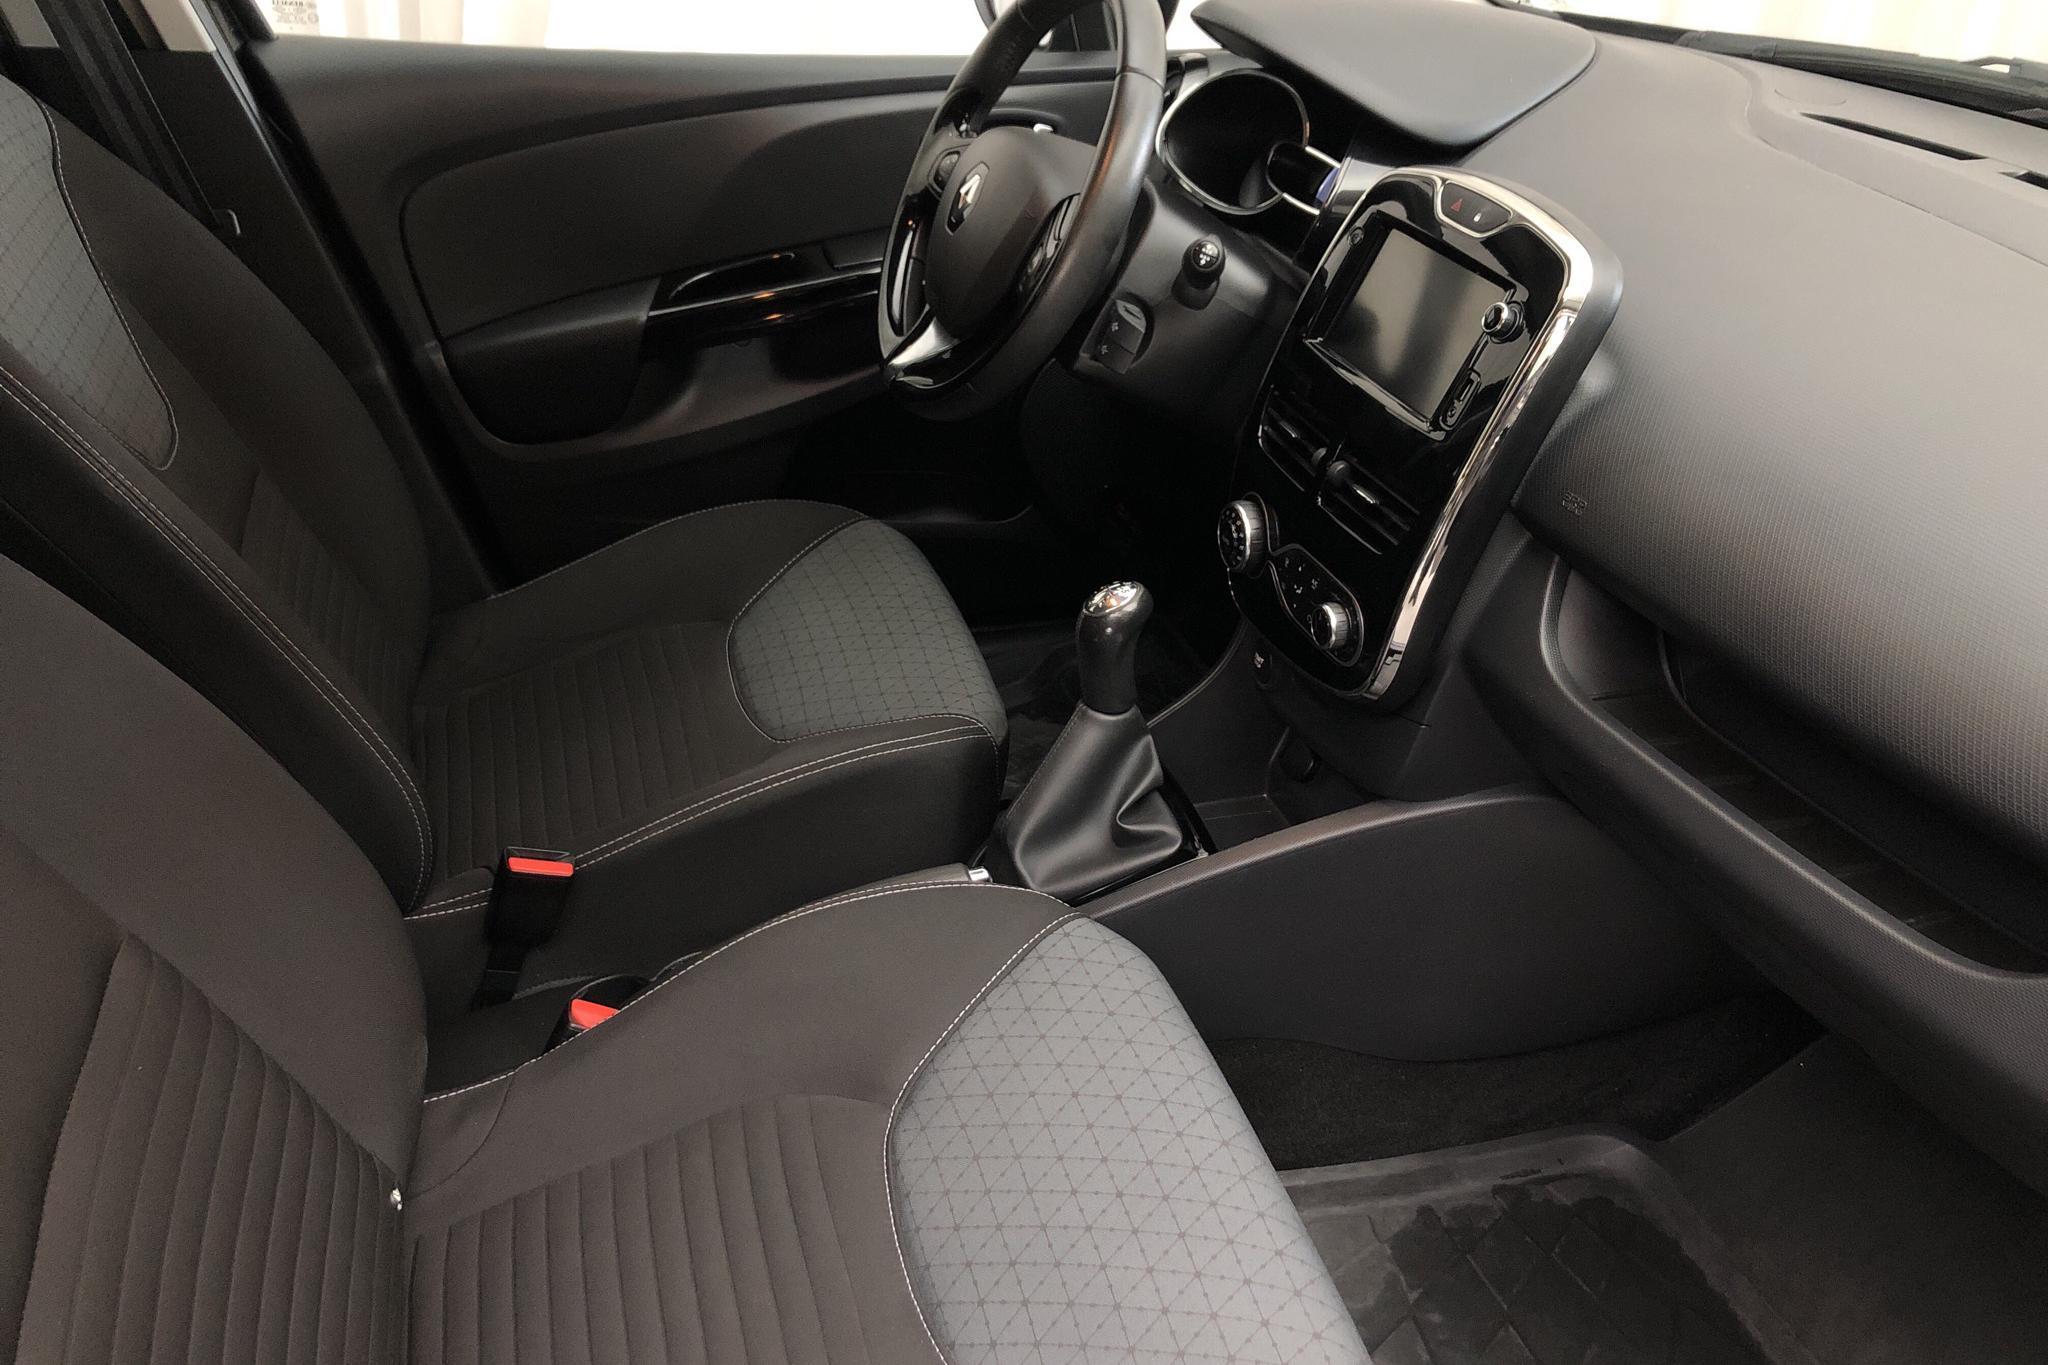 Renault Clio IV 0.9 TCe 90 5dr (90hk) - 56 080 km - Manual - black - 2014